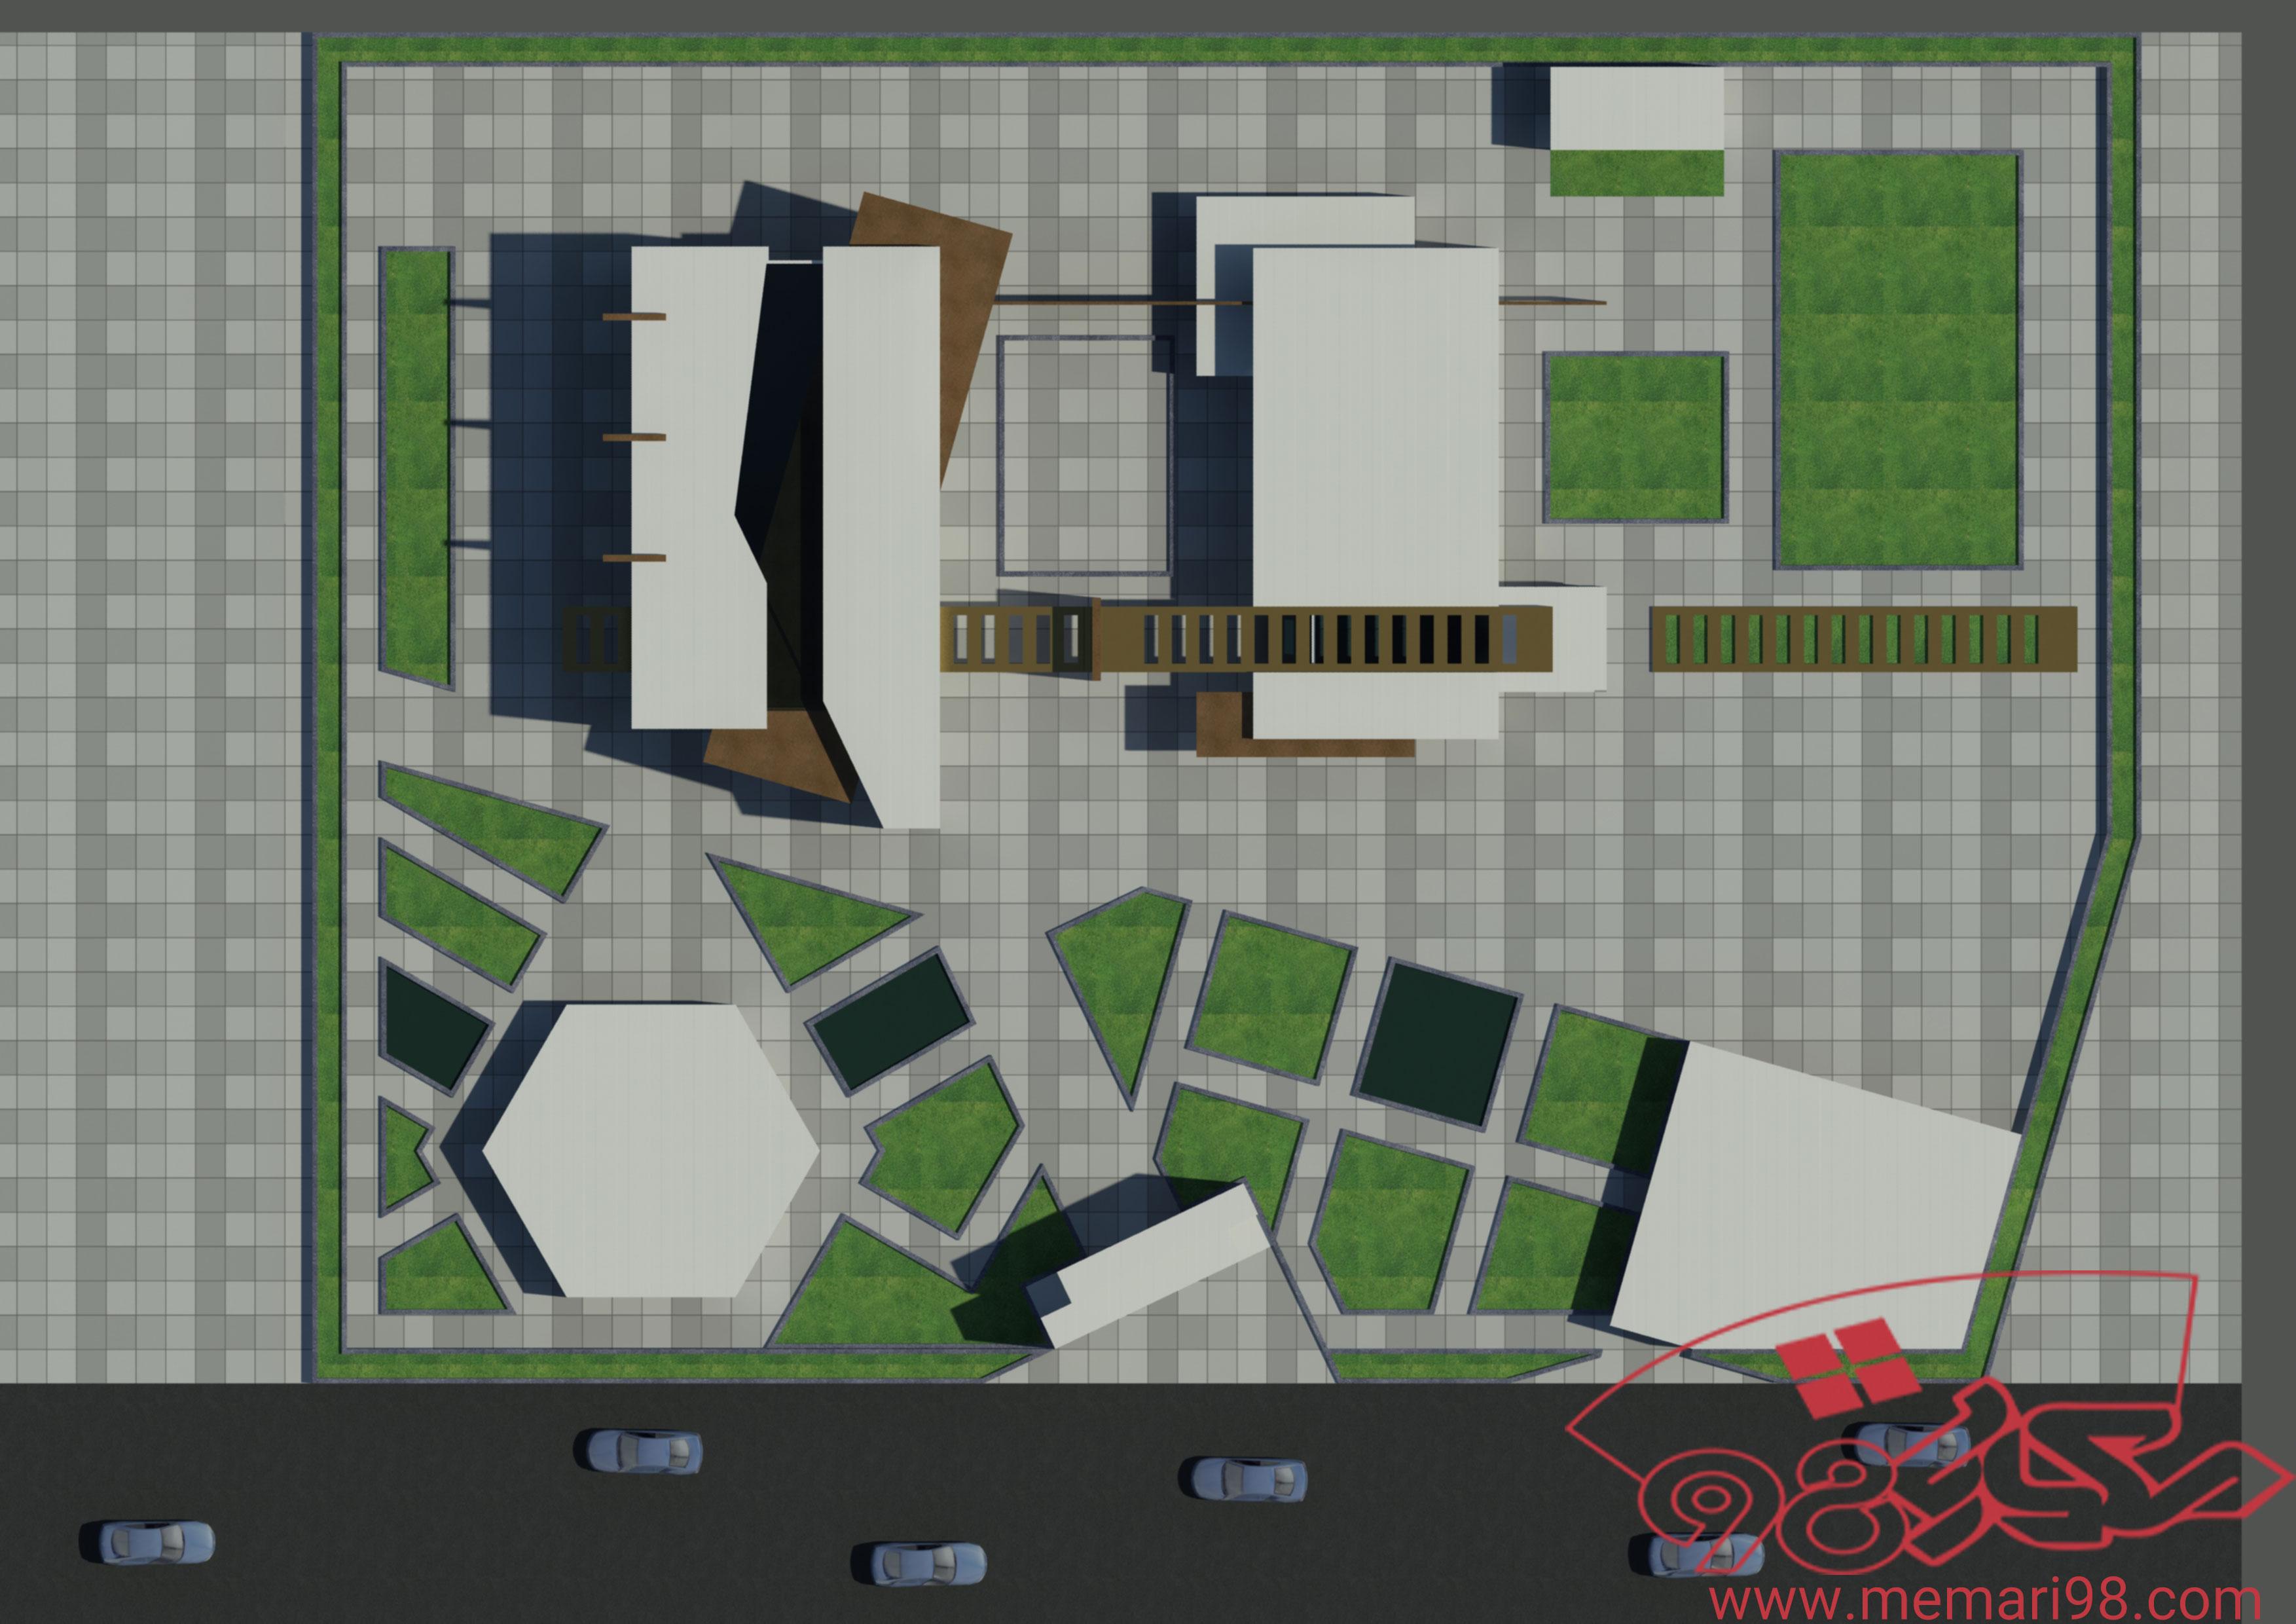 پلان هنرستان ( اتوکد - تری دی مکس - پوستر - psd - رندر )